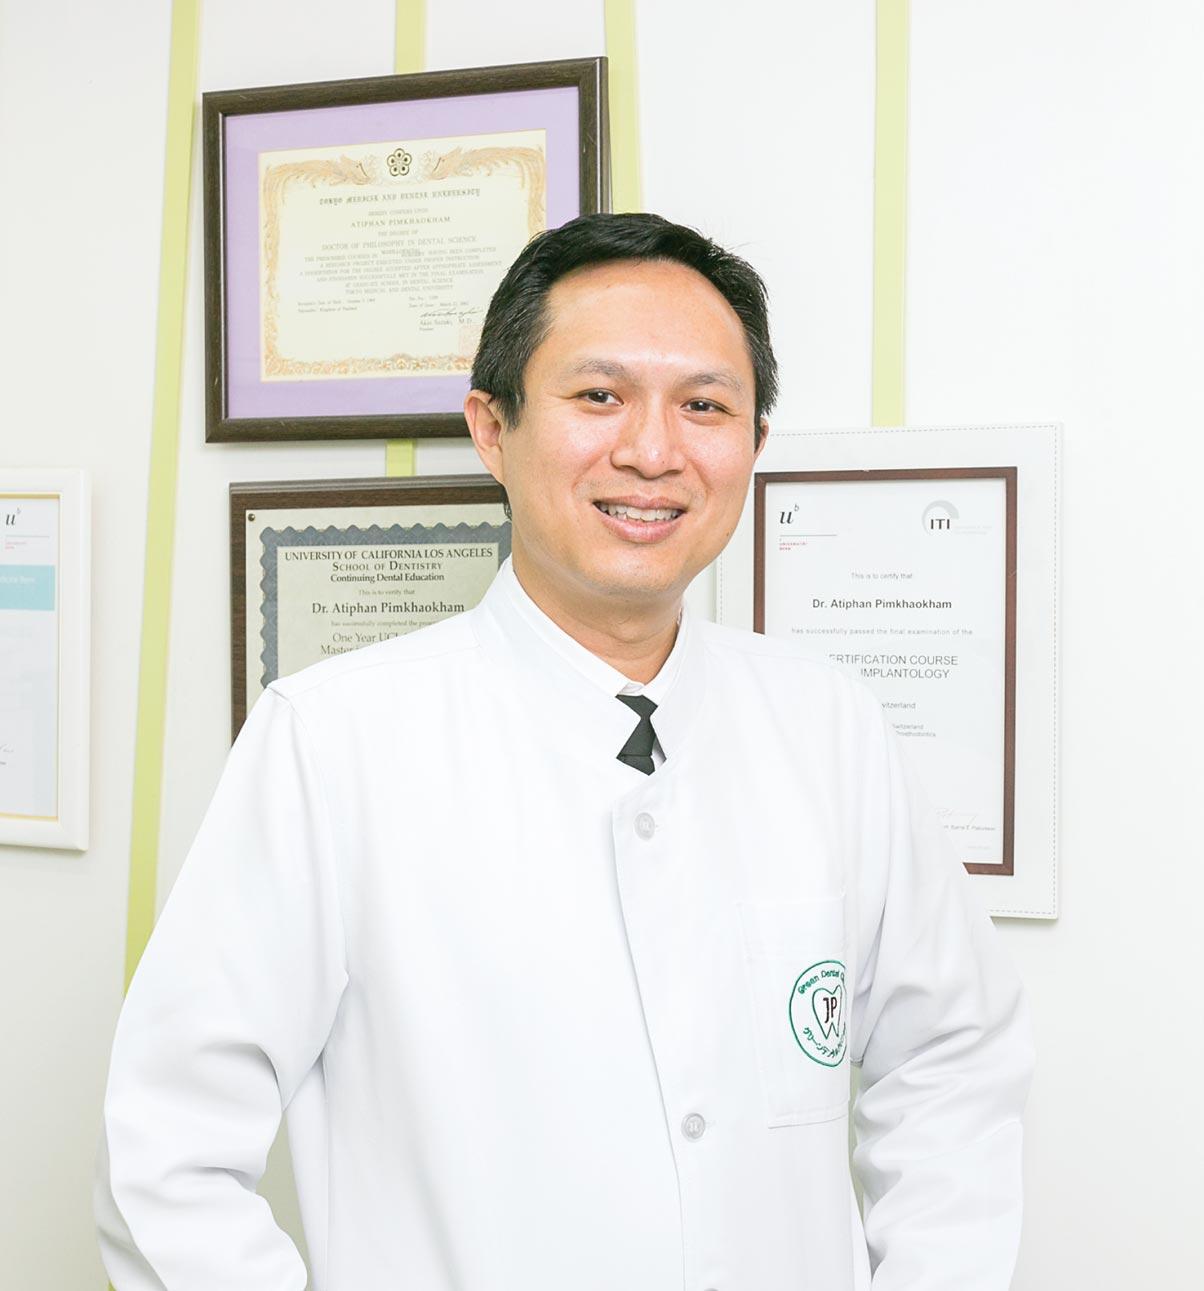 JP グリーンデンタルクリニック - ワイズデジタル【タイで生活する人のための情報サイト】